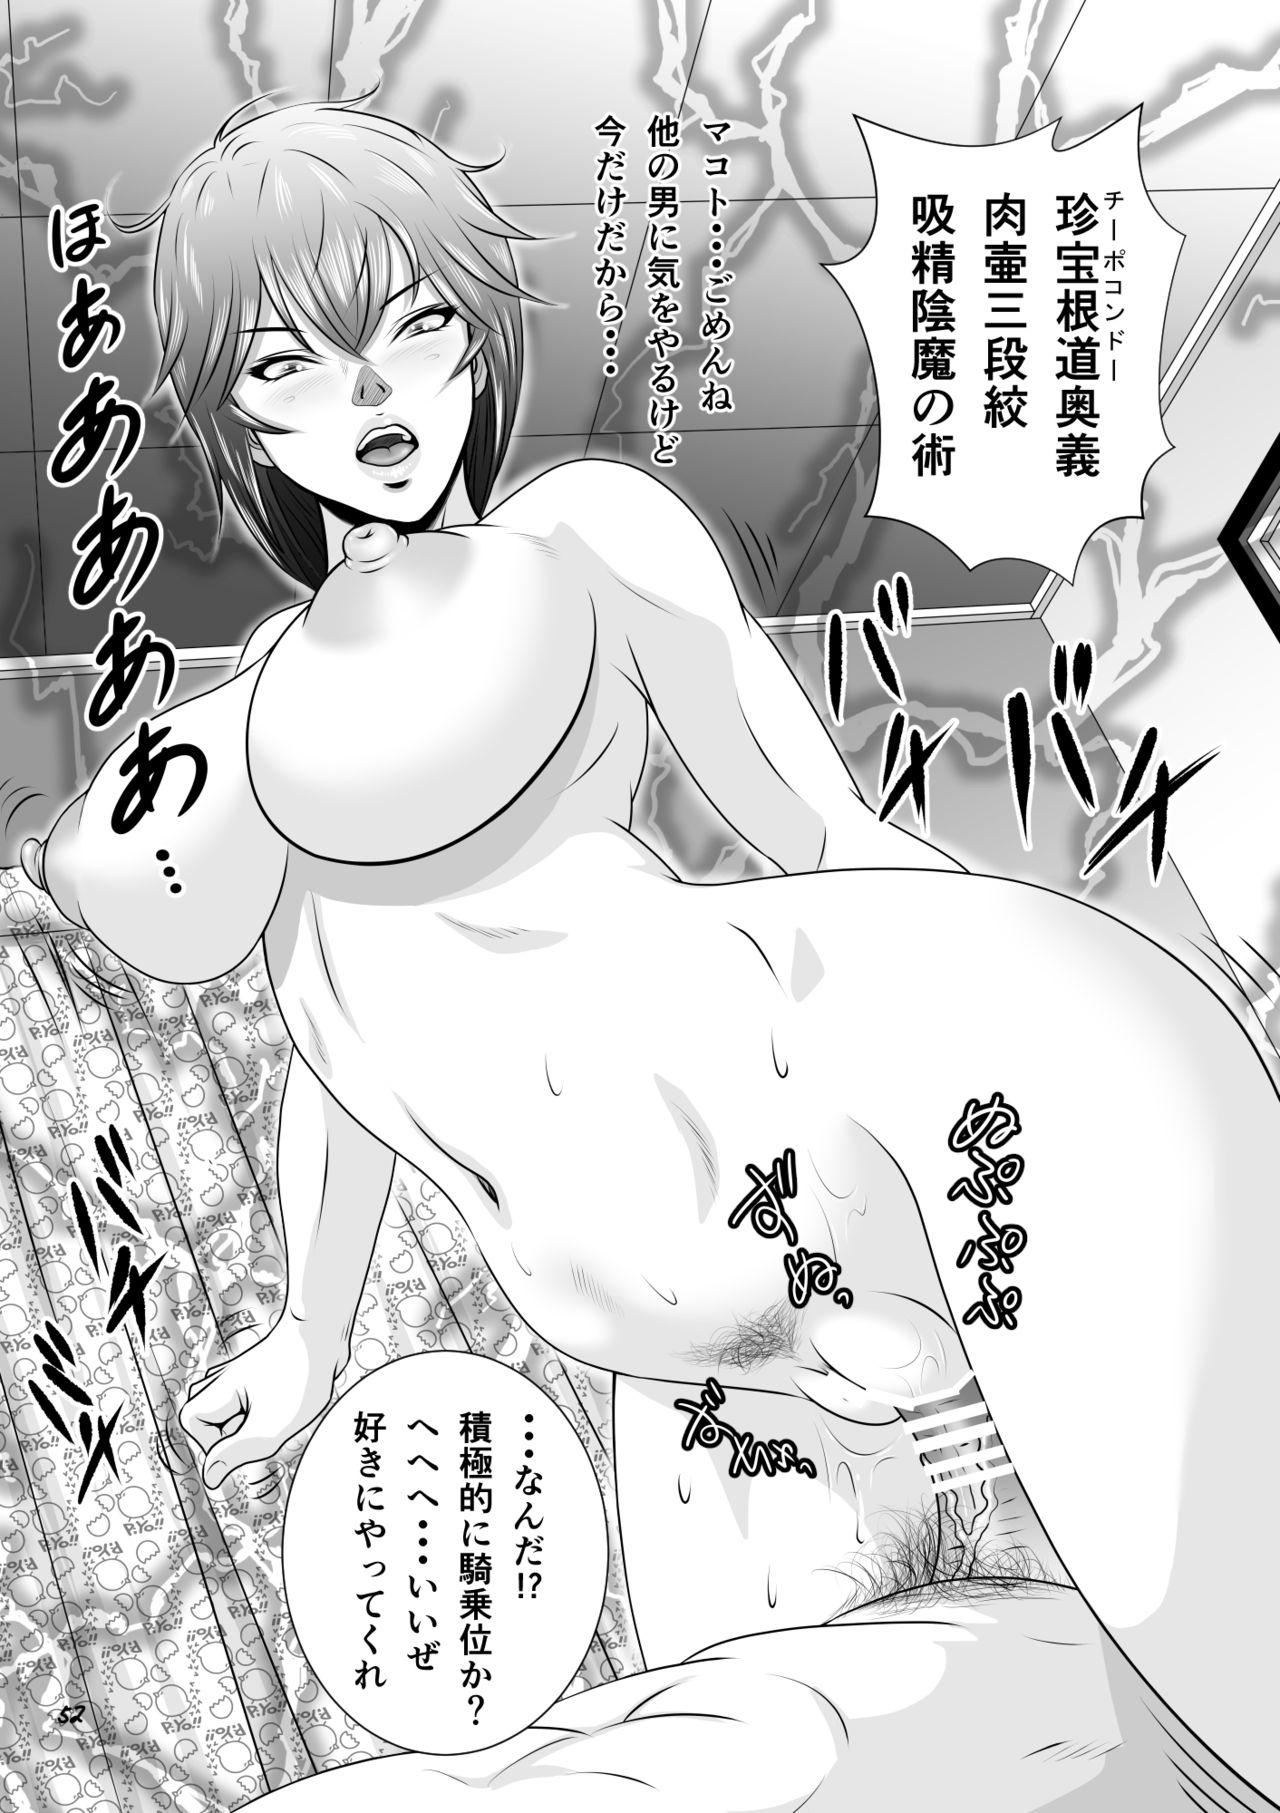 Netorare Osananajimi Haruka-chan Kiki Ippatsu!! 52